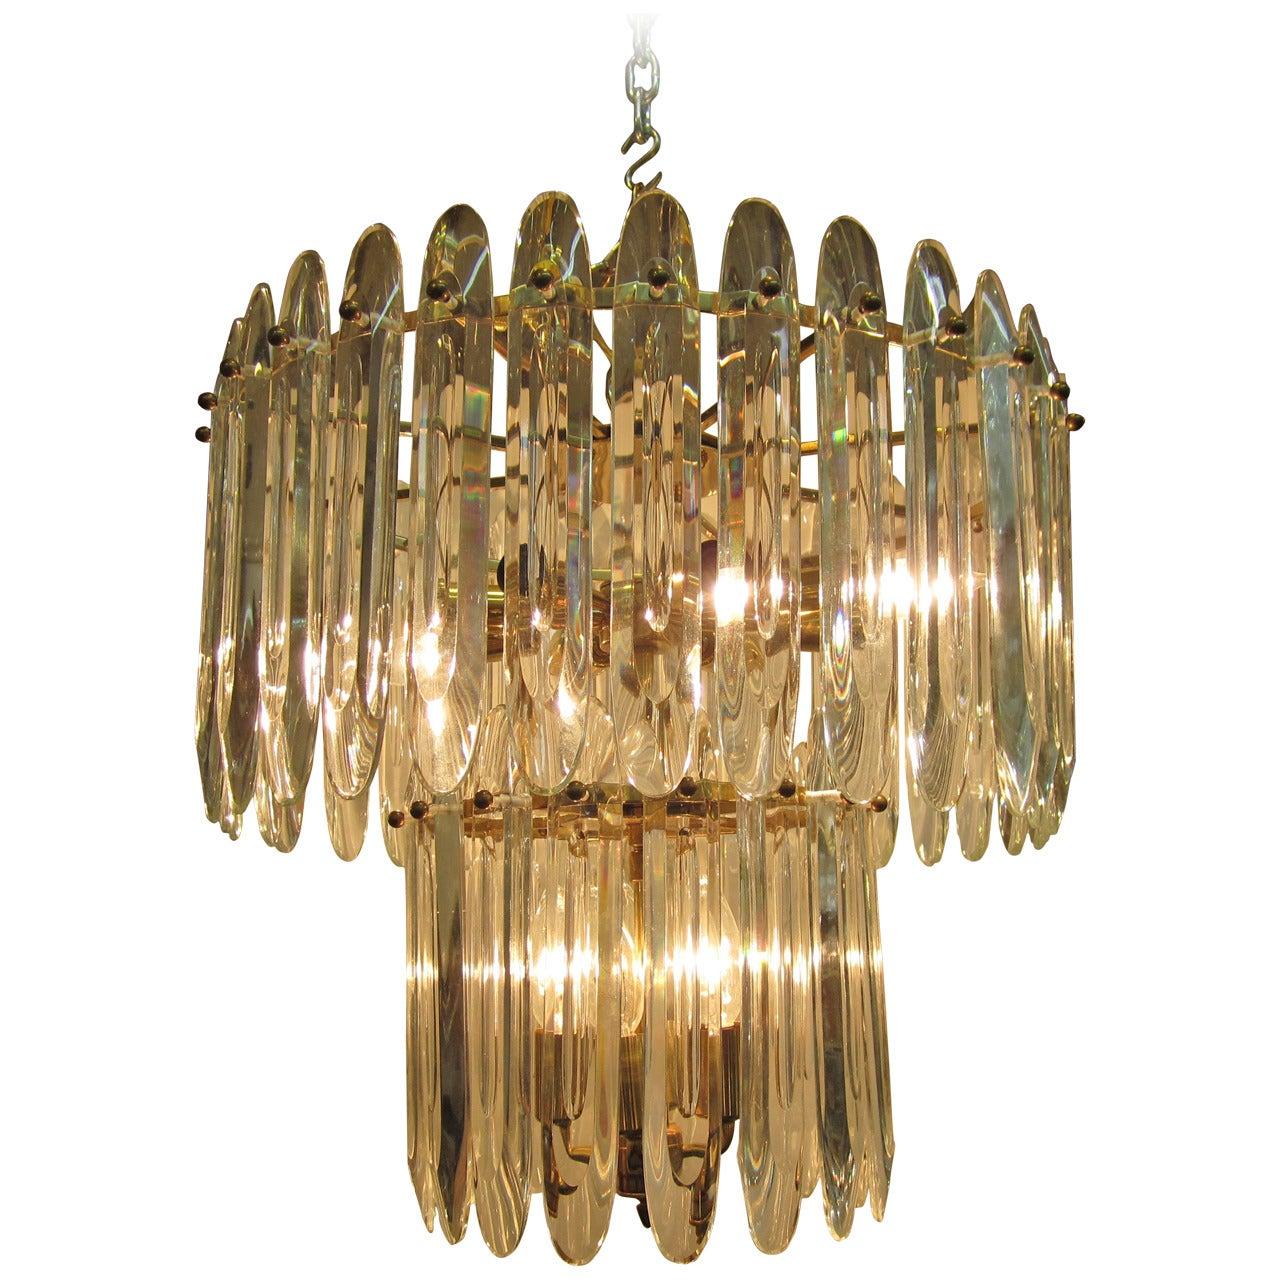 Italian Crystal and Brass Chandelier by Gaetano Sciolari